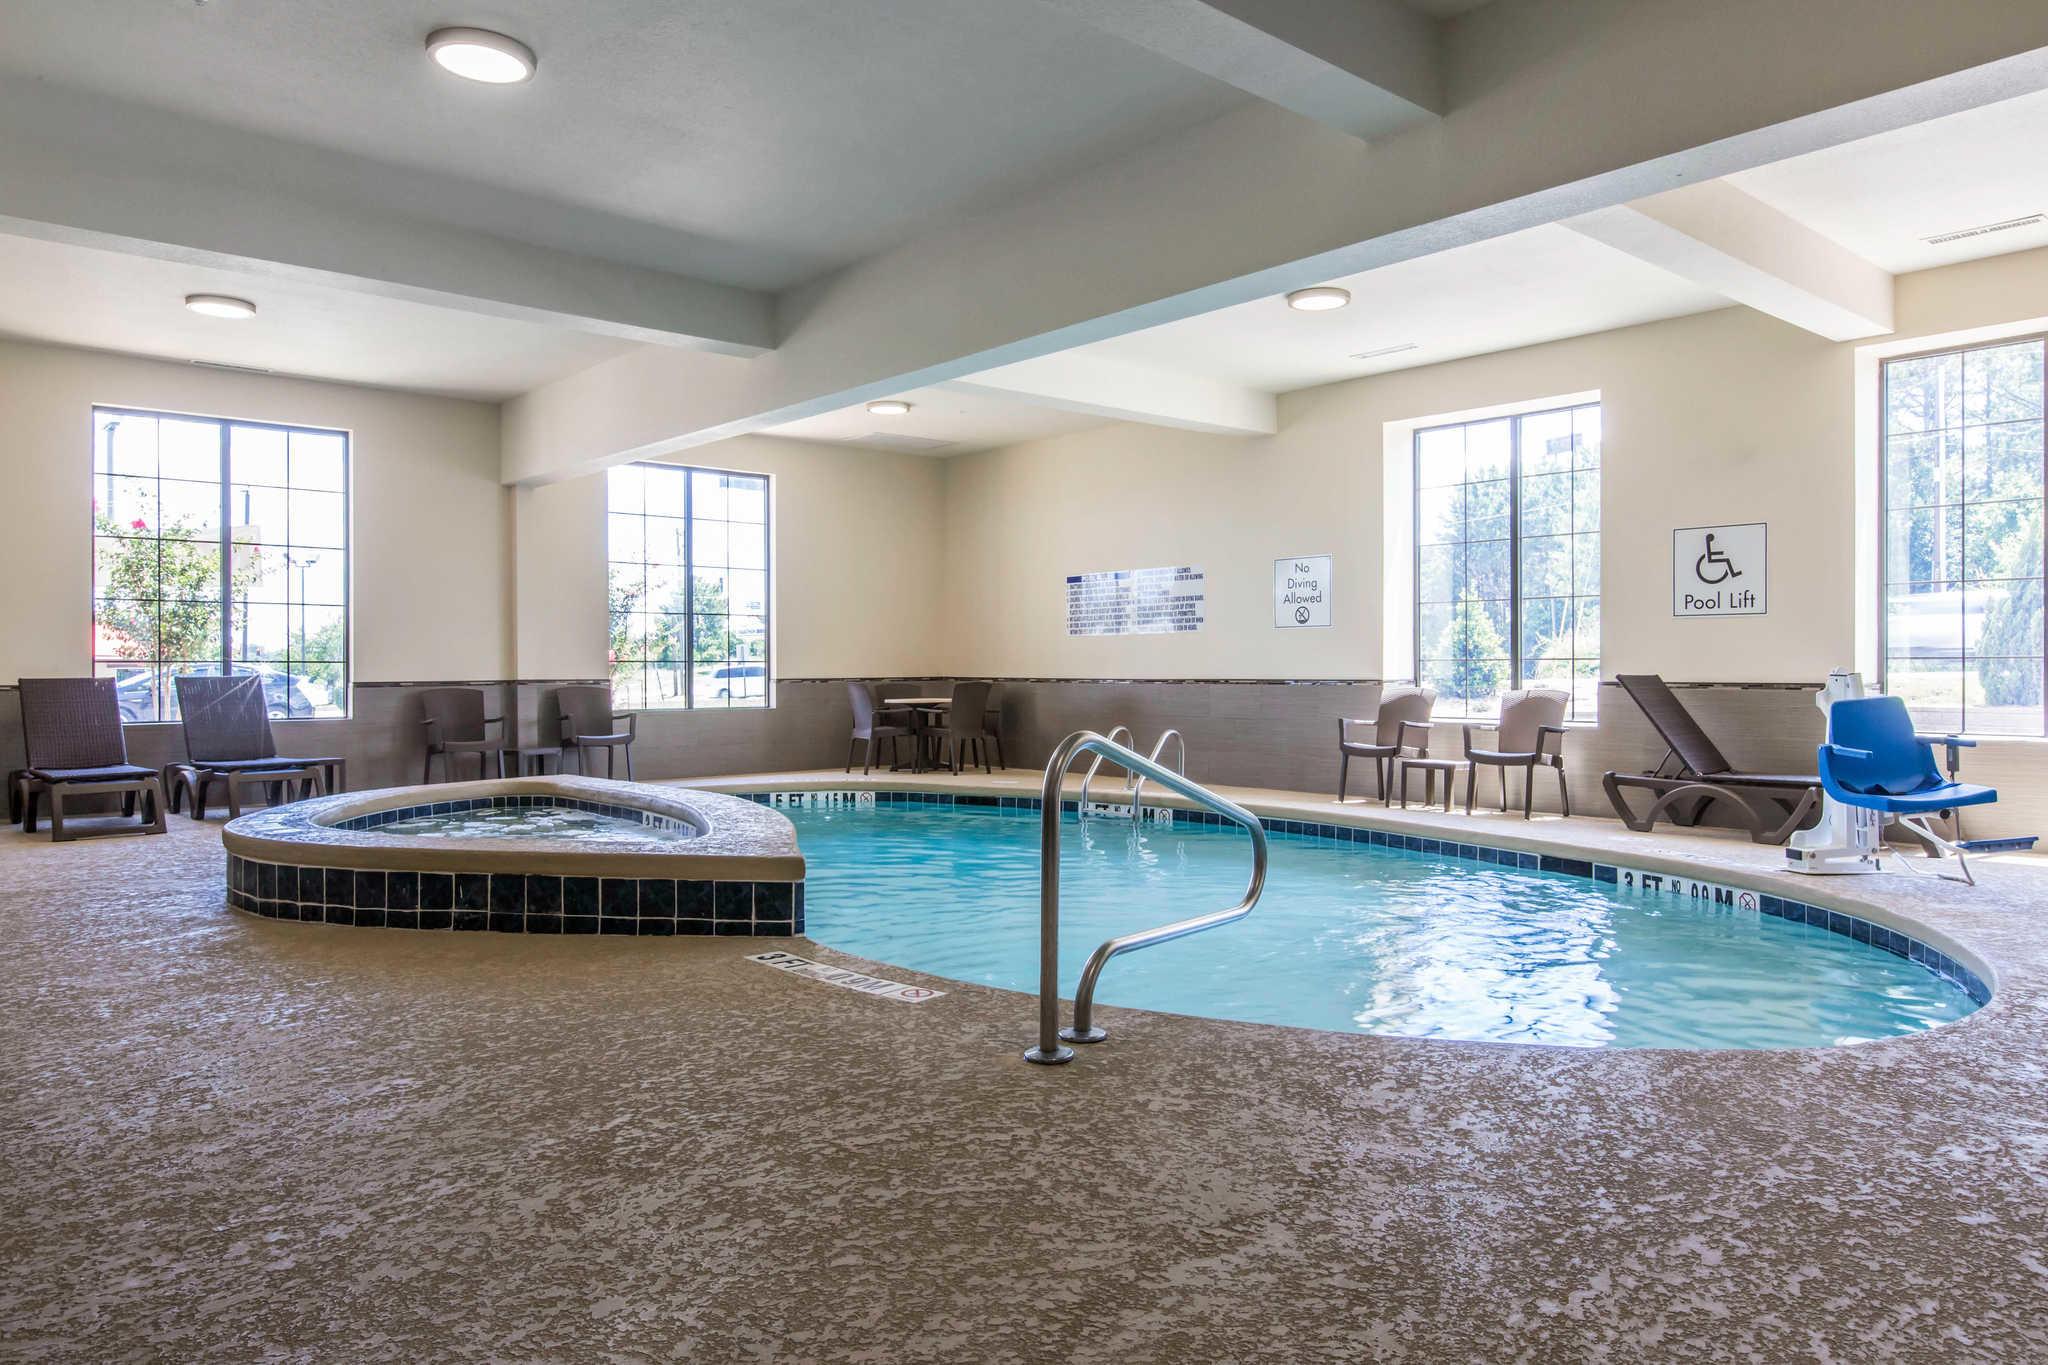 Comfort Inn & Suites West image 29